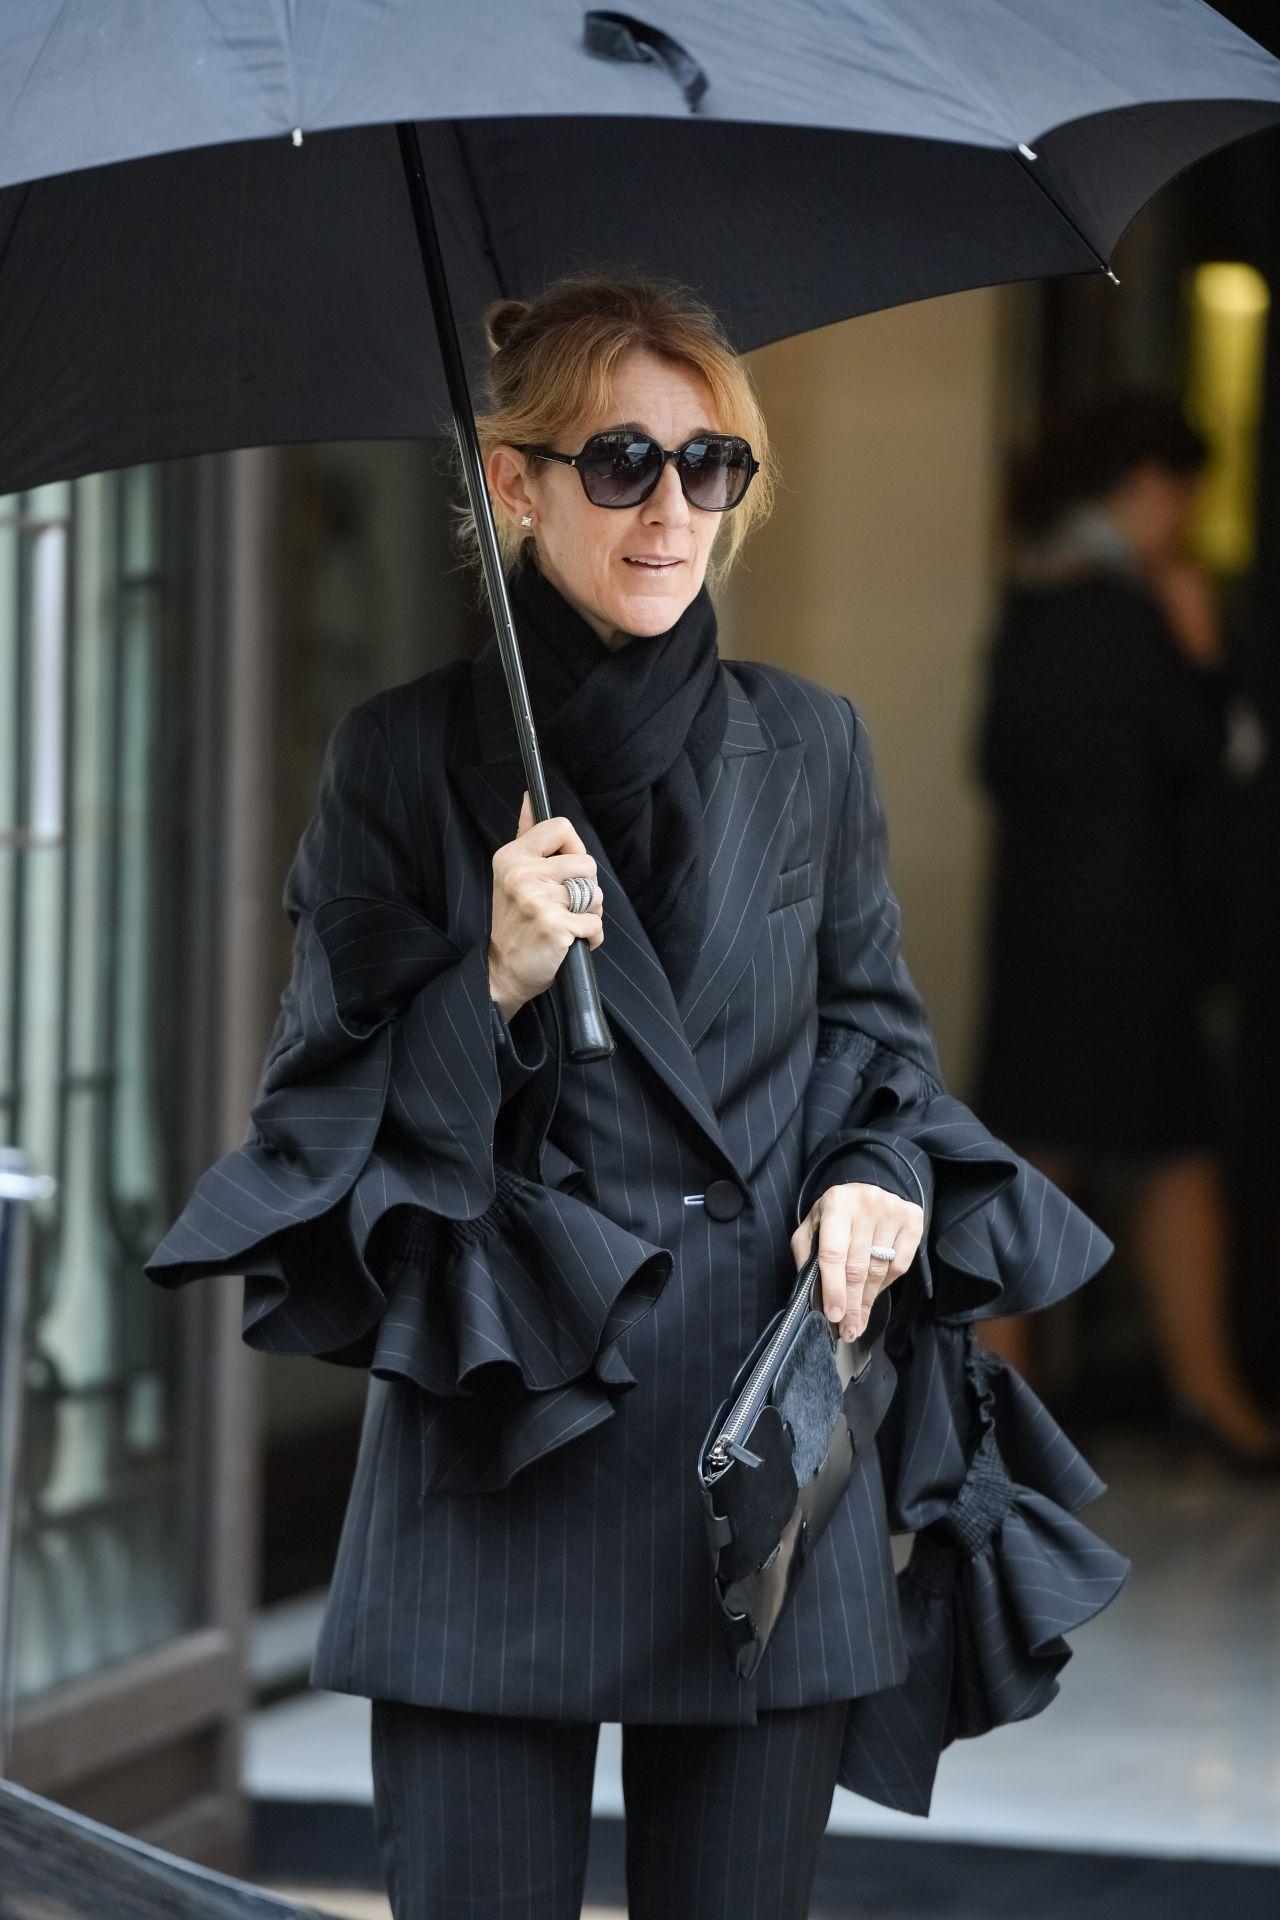 Celine Dion Leaving The Royal Monceau Hotel In Paris 07